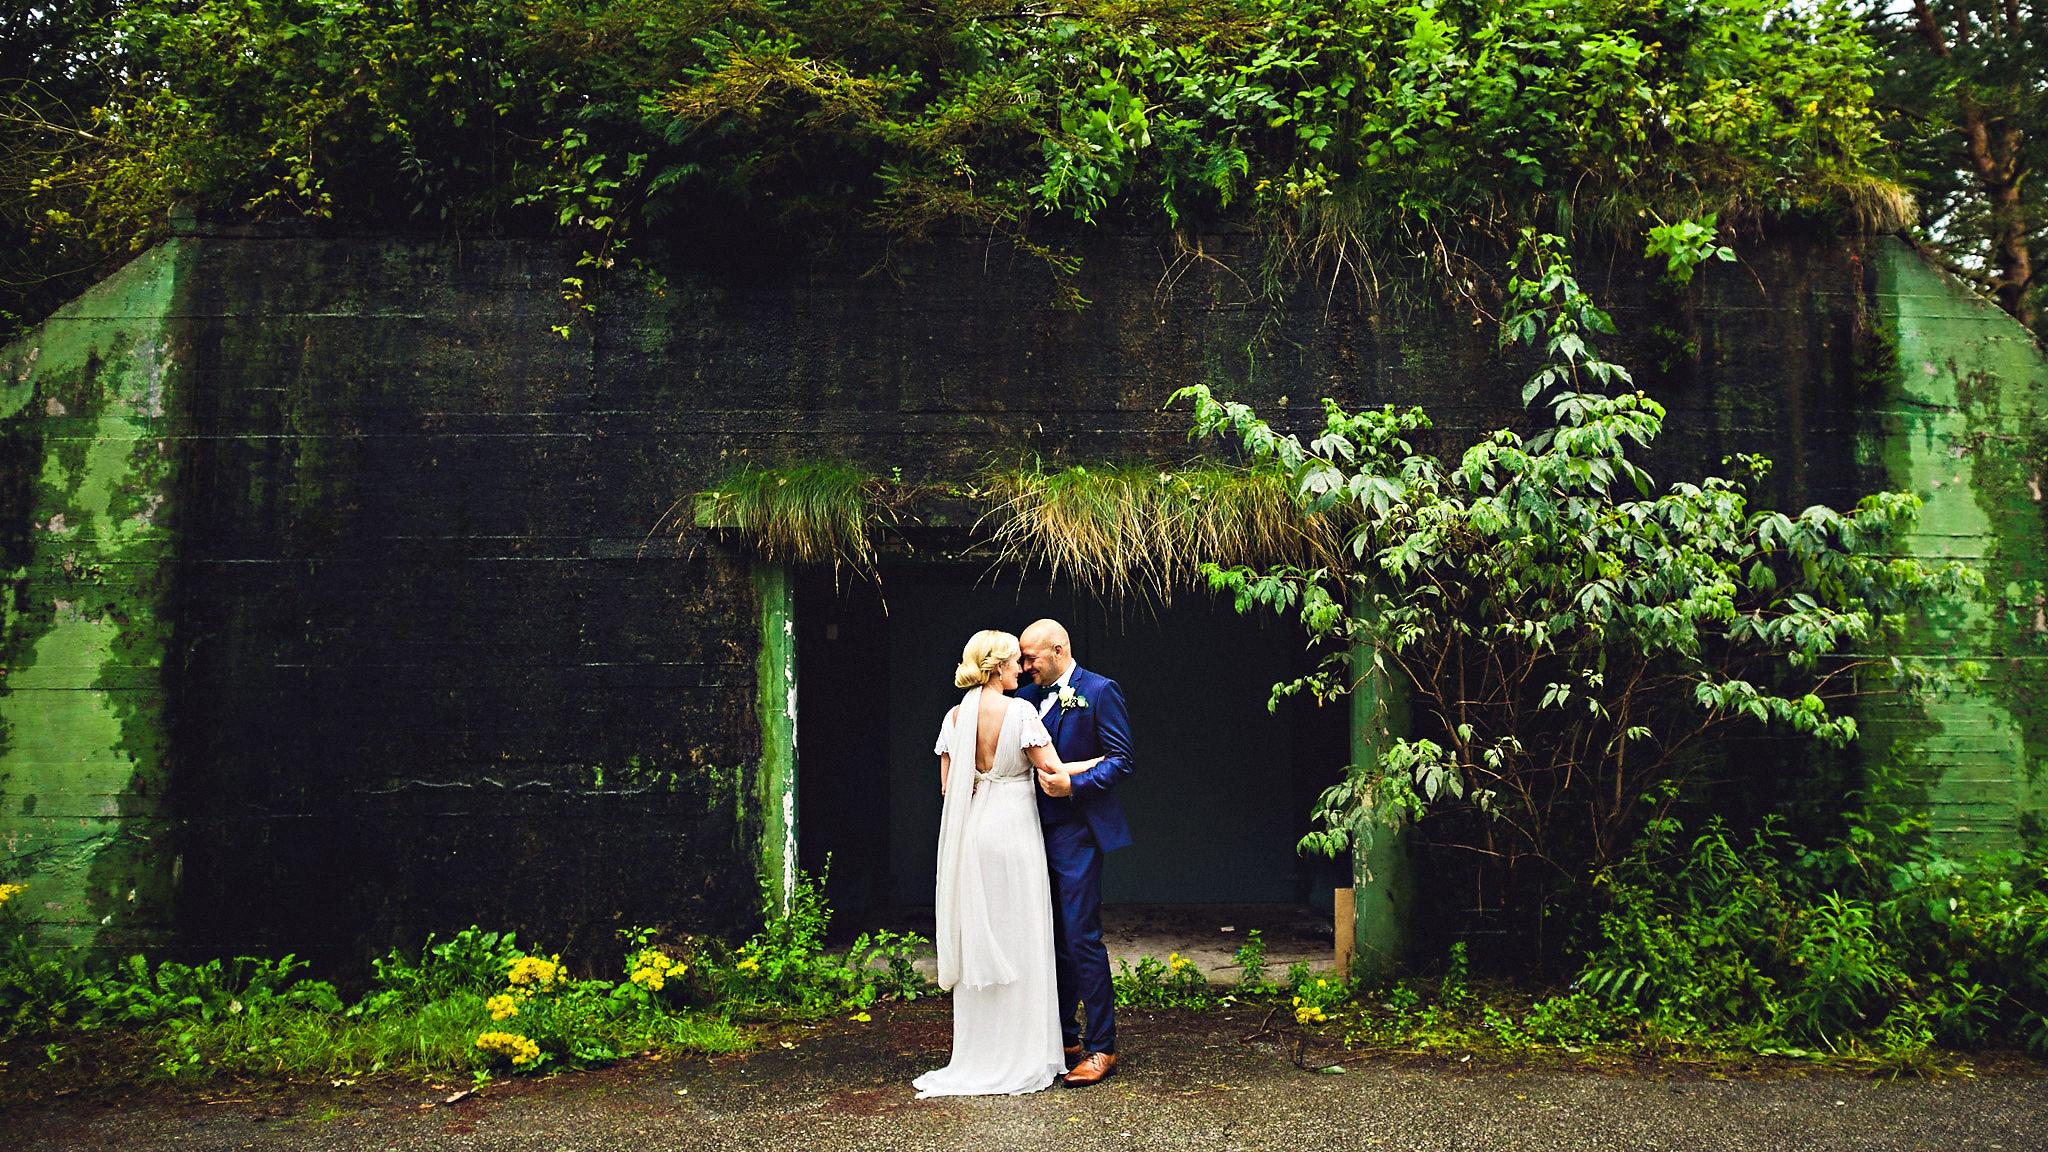 Bryllup på Solastranden Gård fotograf Eirik Halvorsen-26.jpg